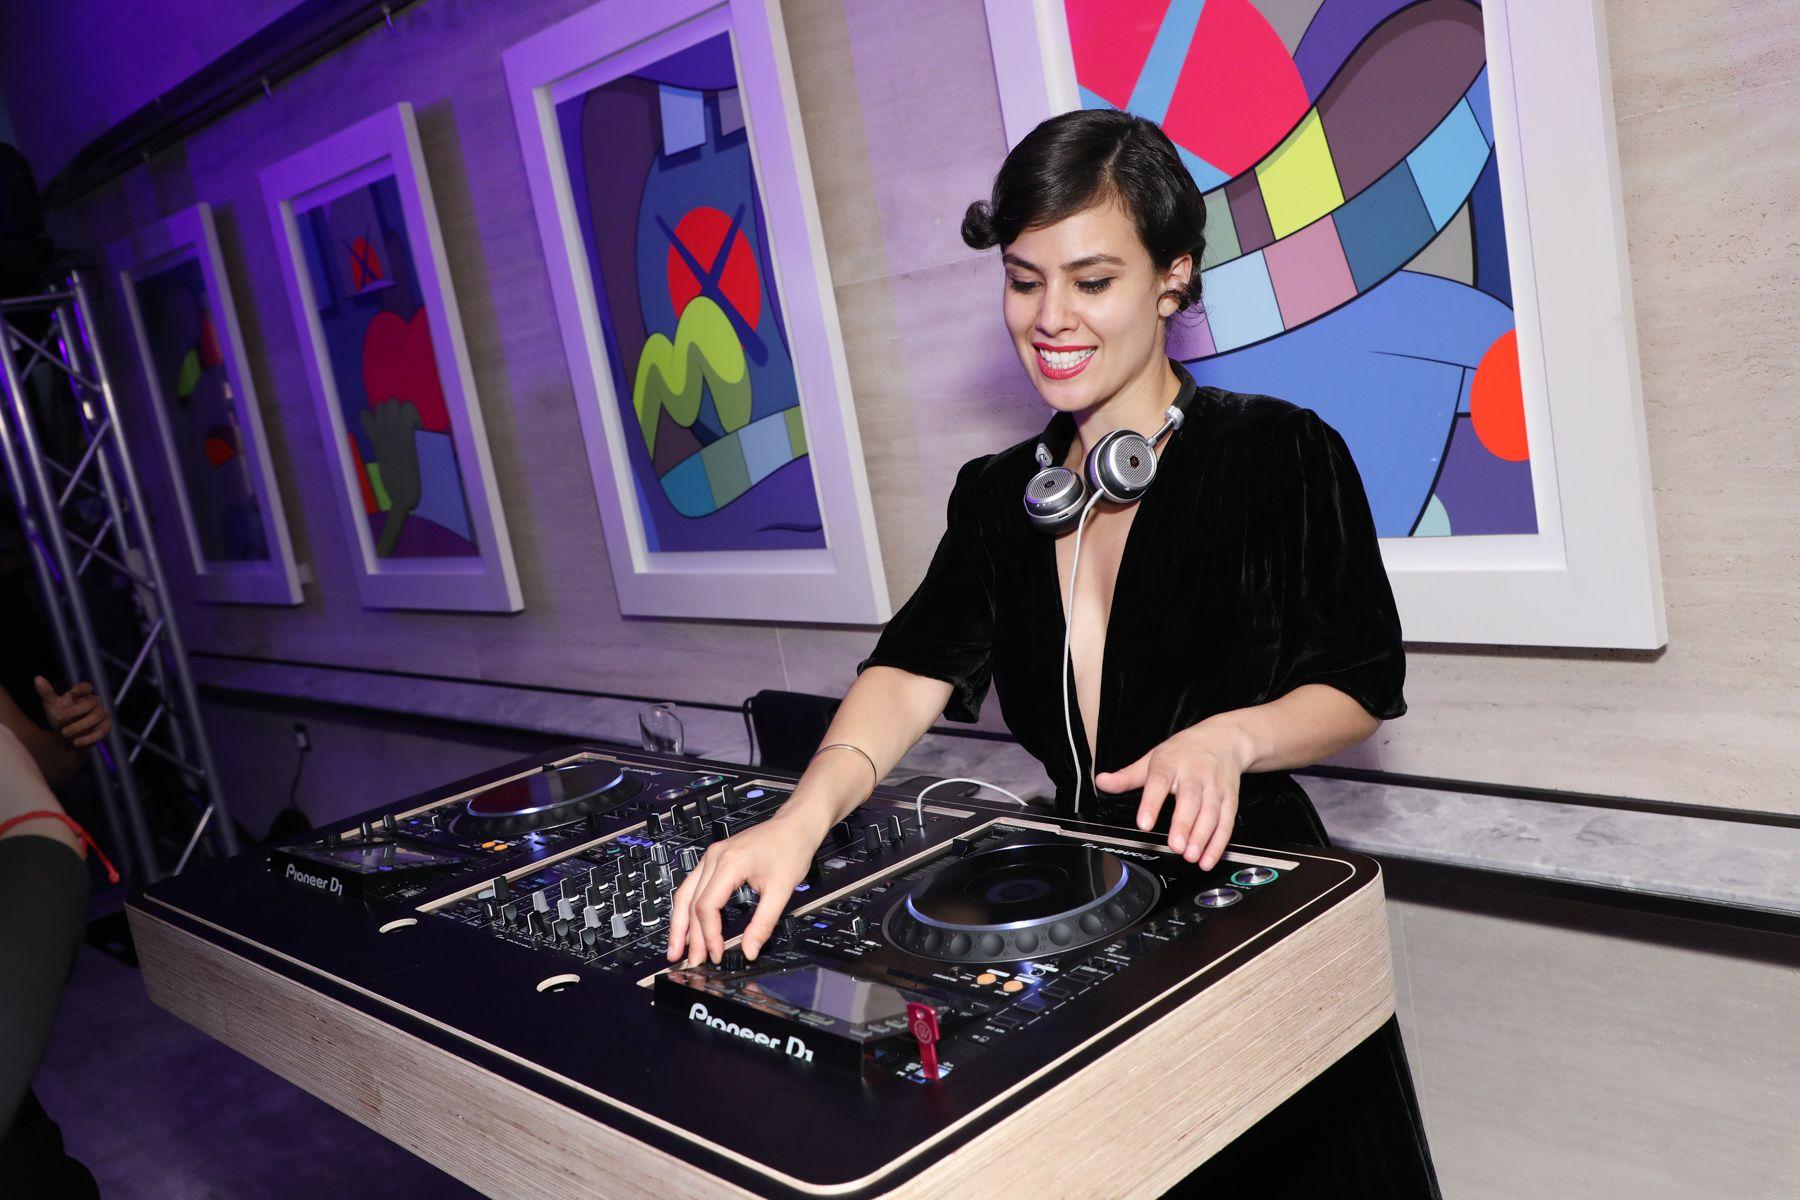 DJ Yelda